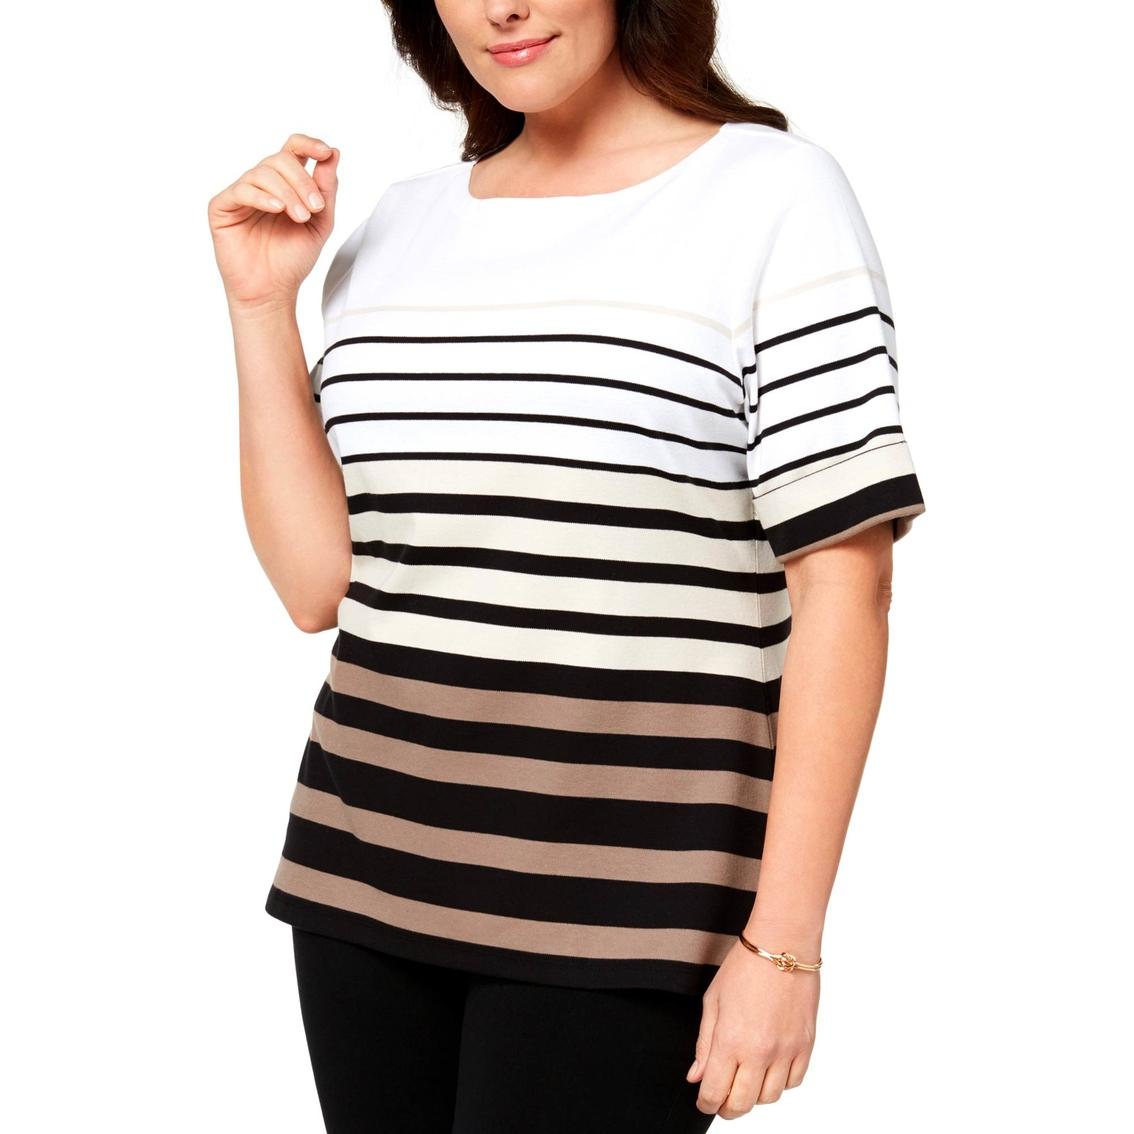 d78d429f Karen Scott Plus Size Cotton Striped T Shirt   T-shirts   Apparel ...